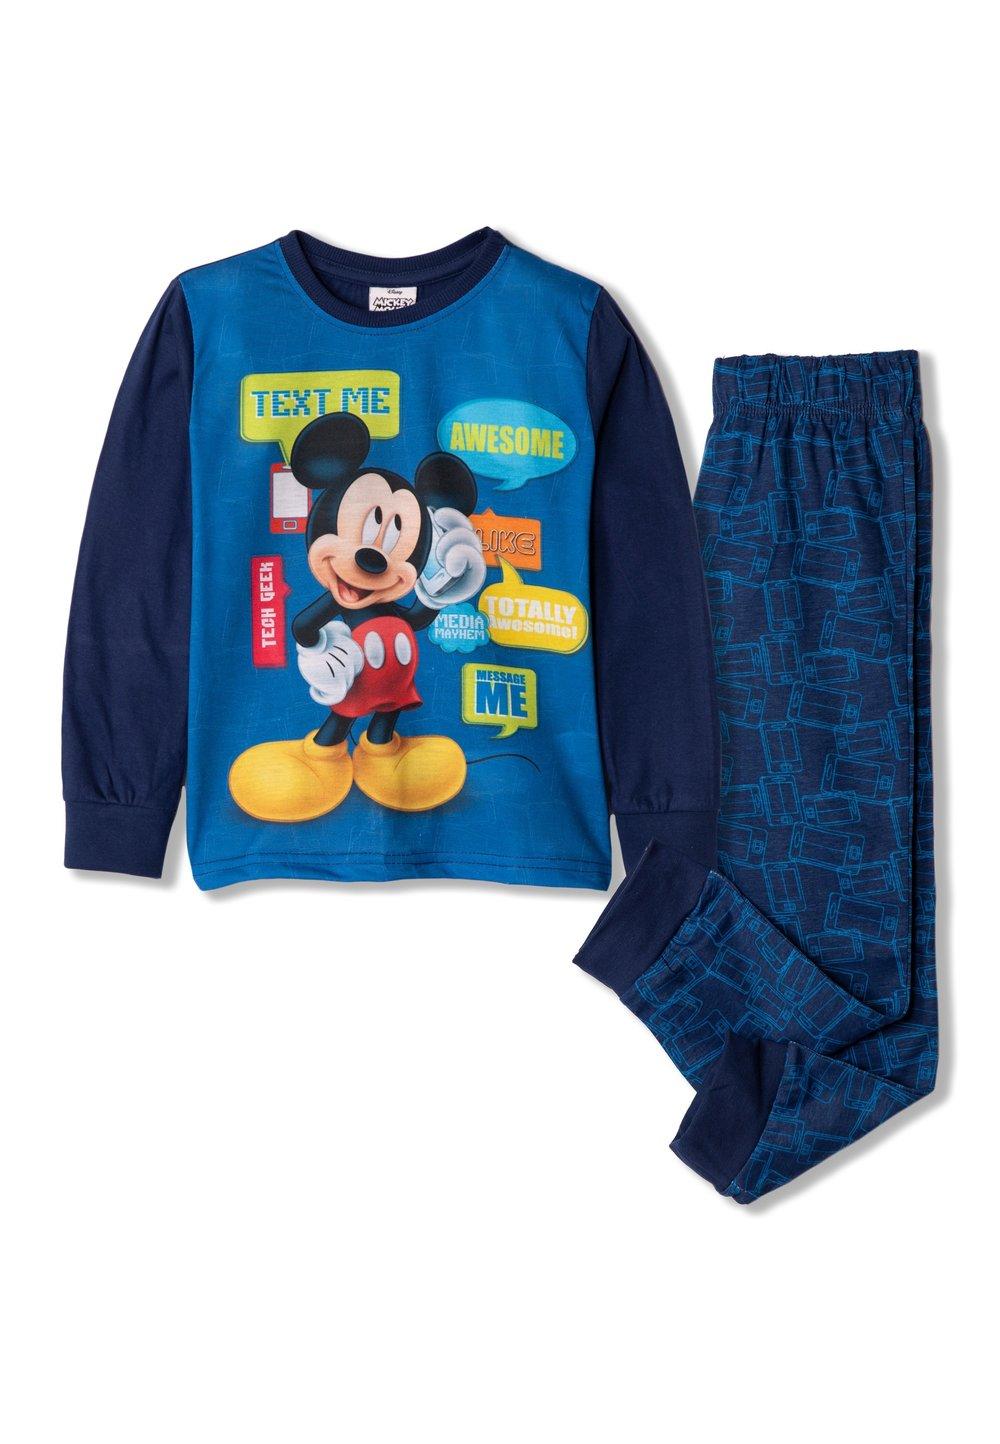 Pijama, Mickey text me, bluemarin